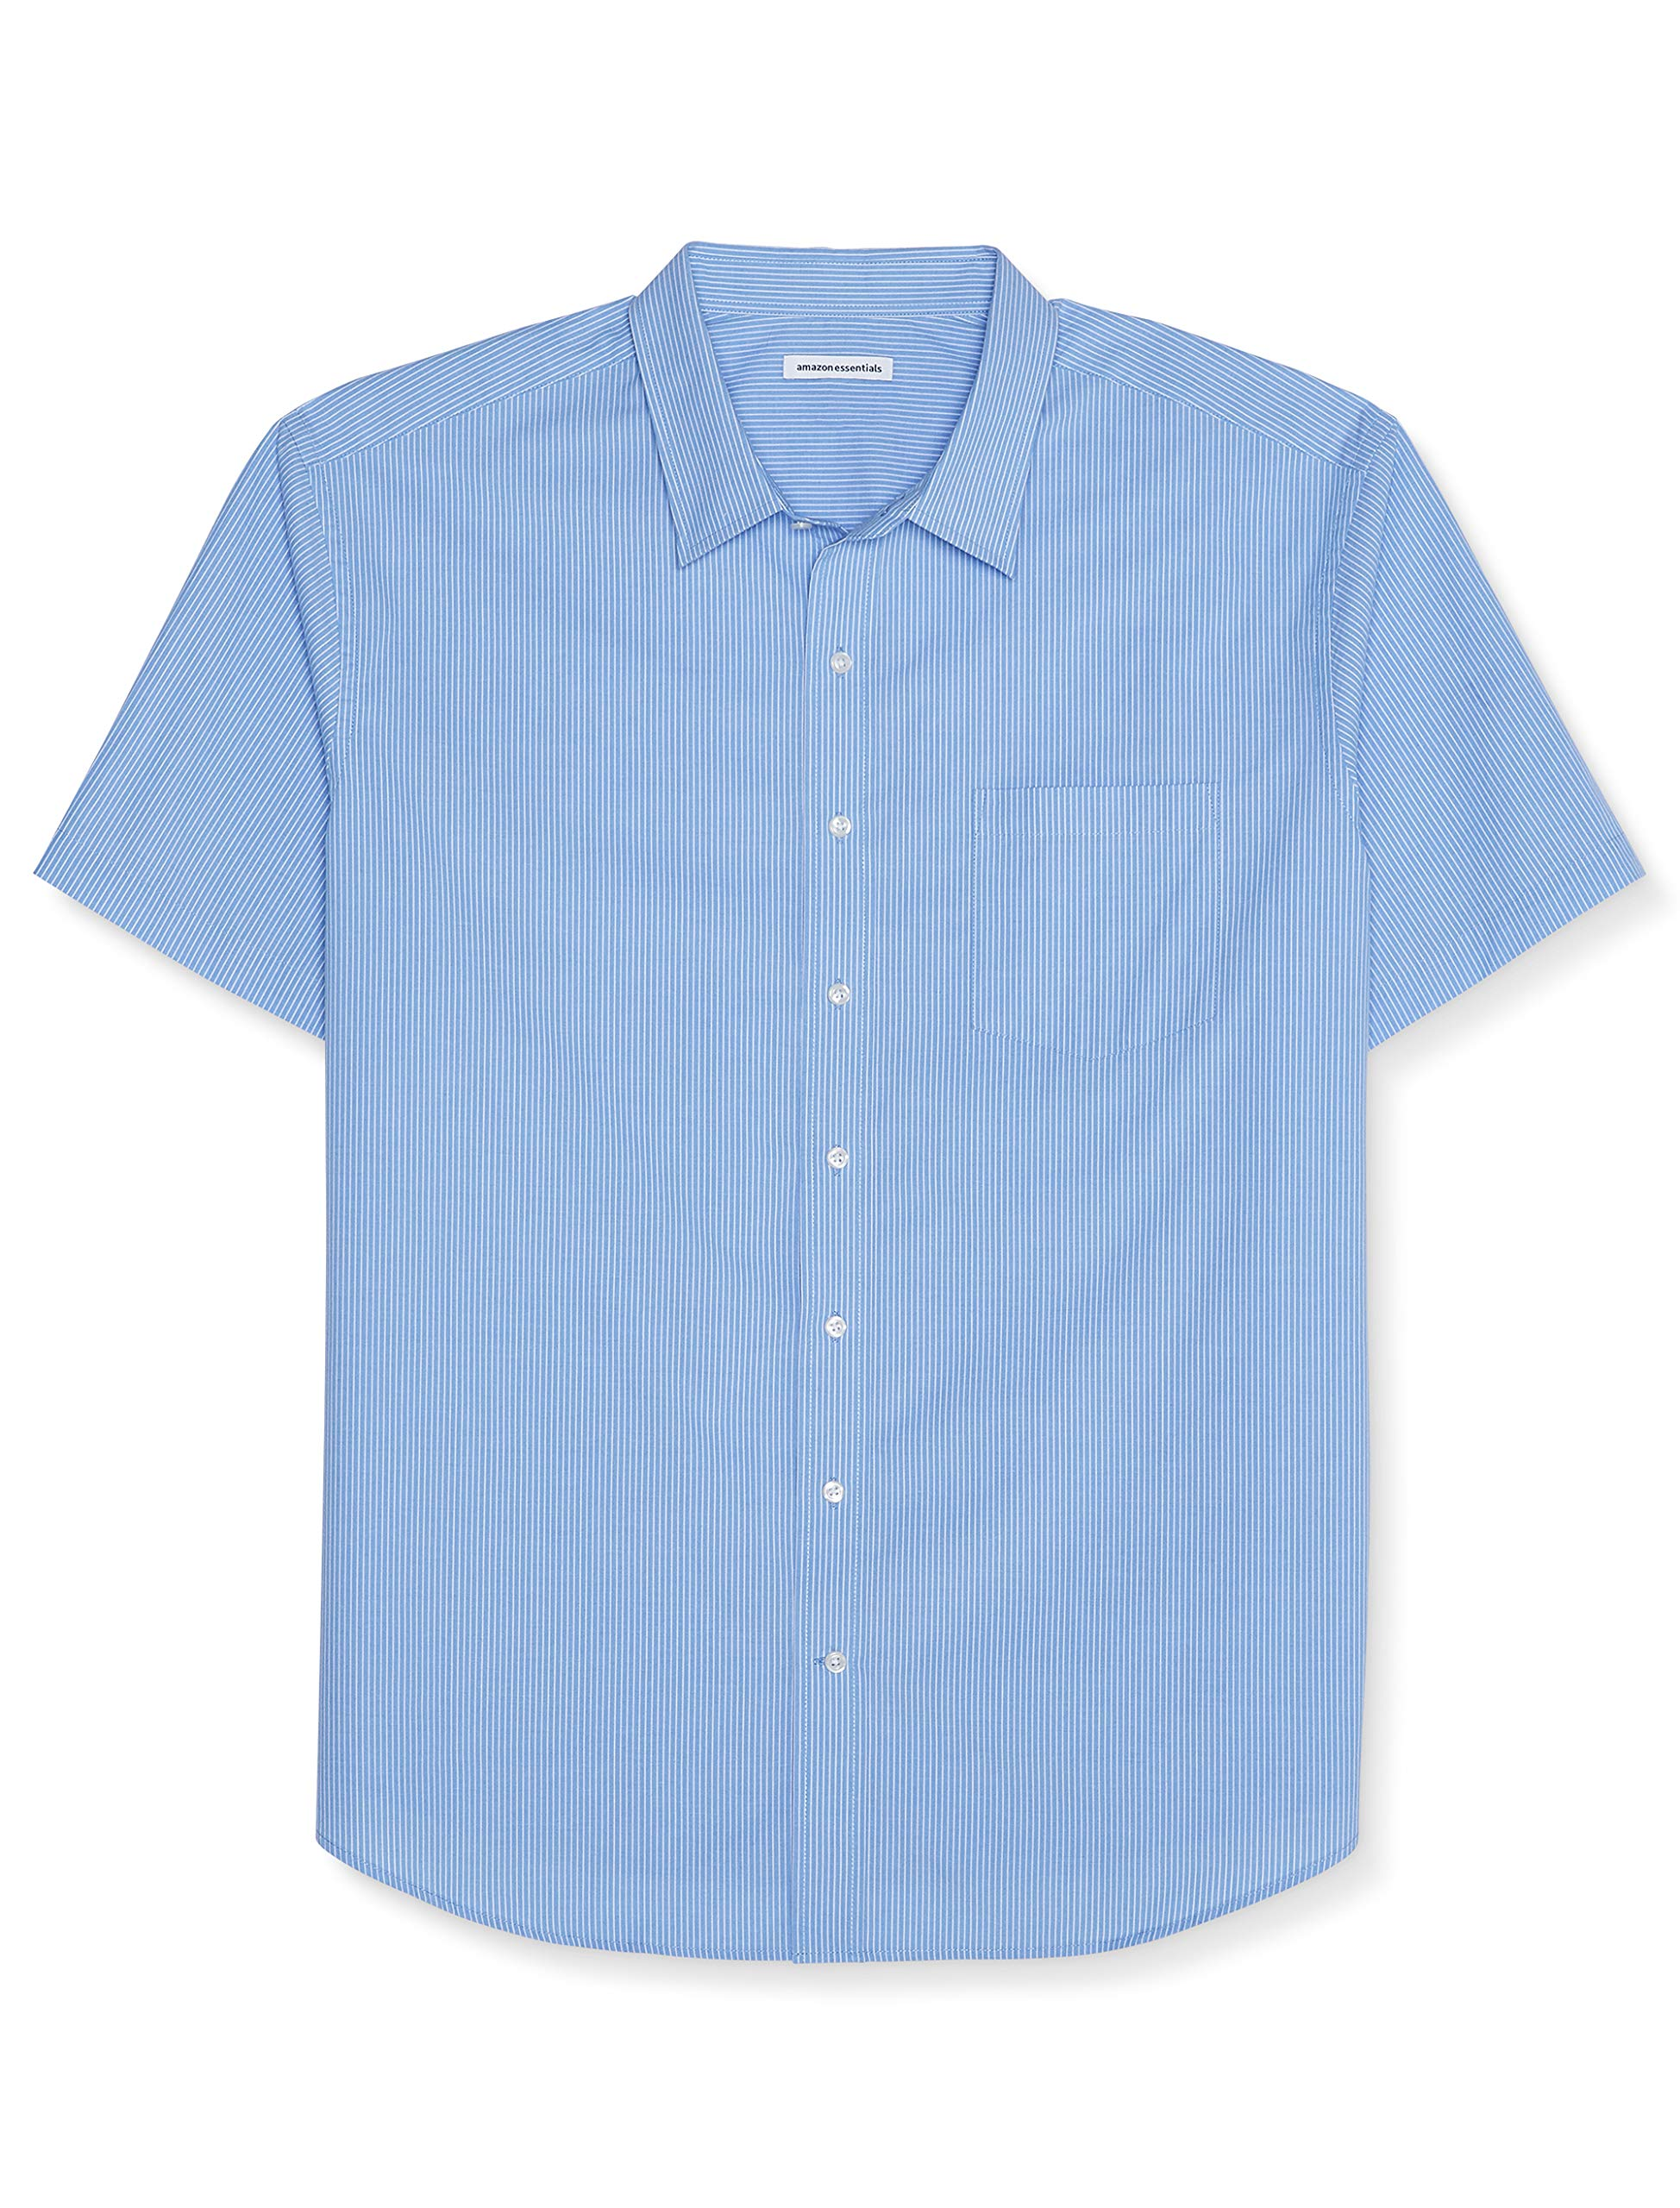 Amazon Essentials Men's Big & Tall Short-Sleeve Stripe Shirt fit by DXL